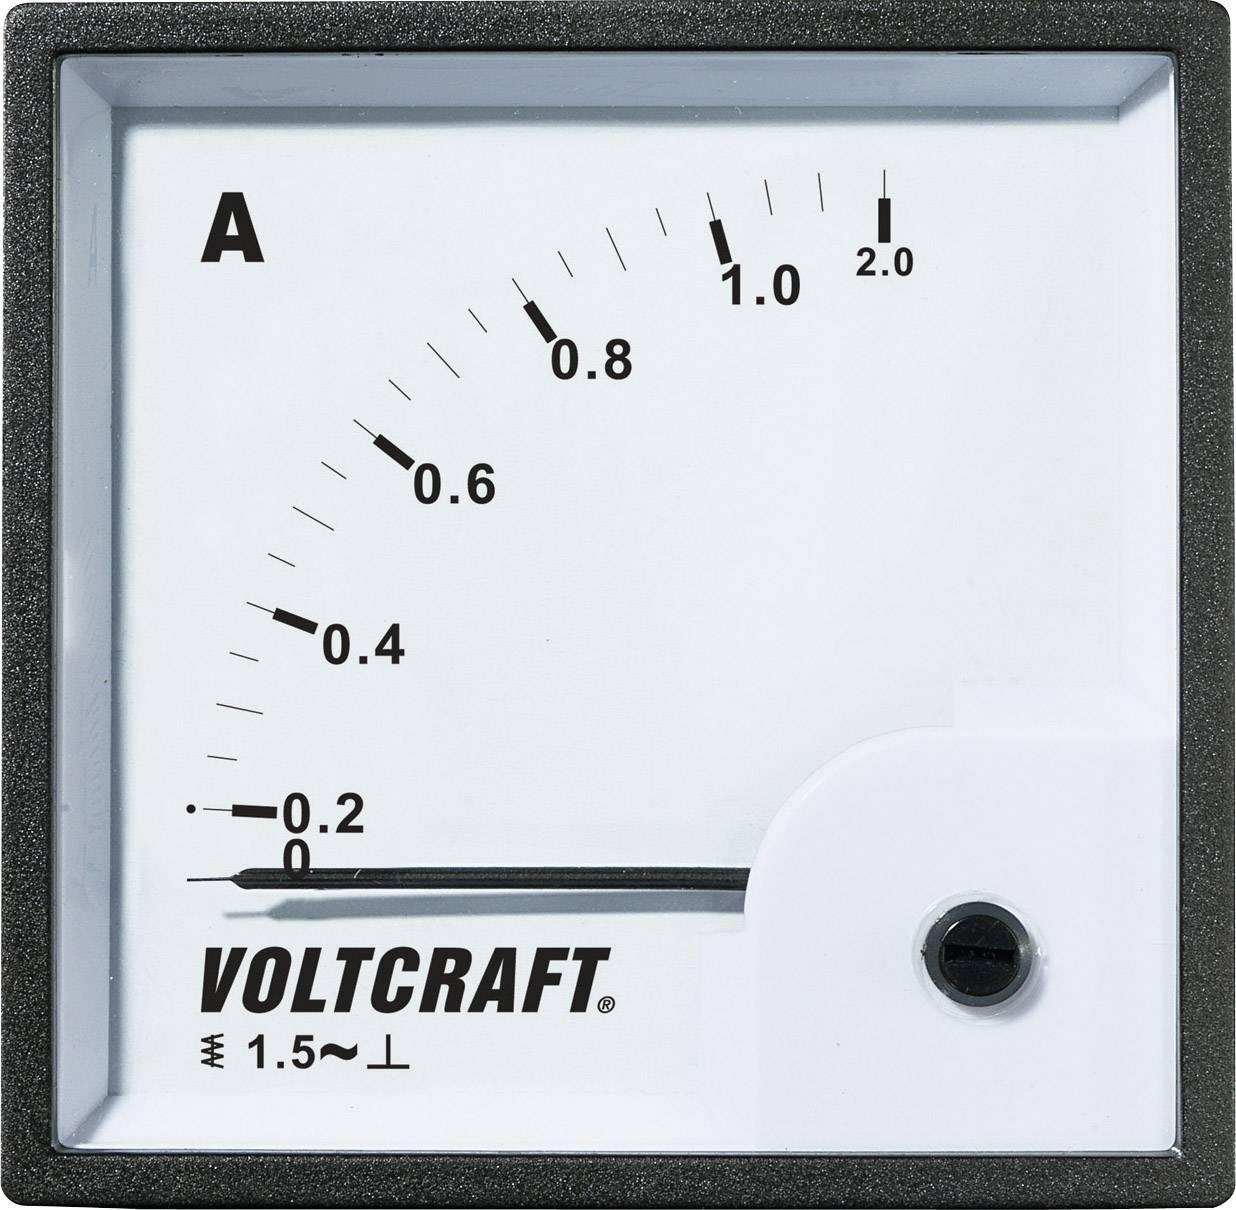 VOLTCRAFT AM-72X72/1A Analogni ugradbeni mjerni uređaj  1 A pomično željezo